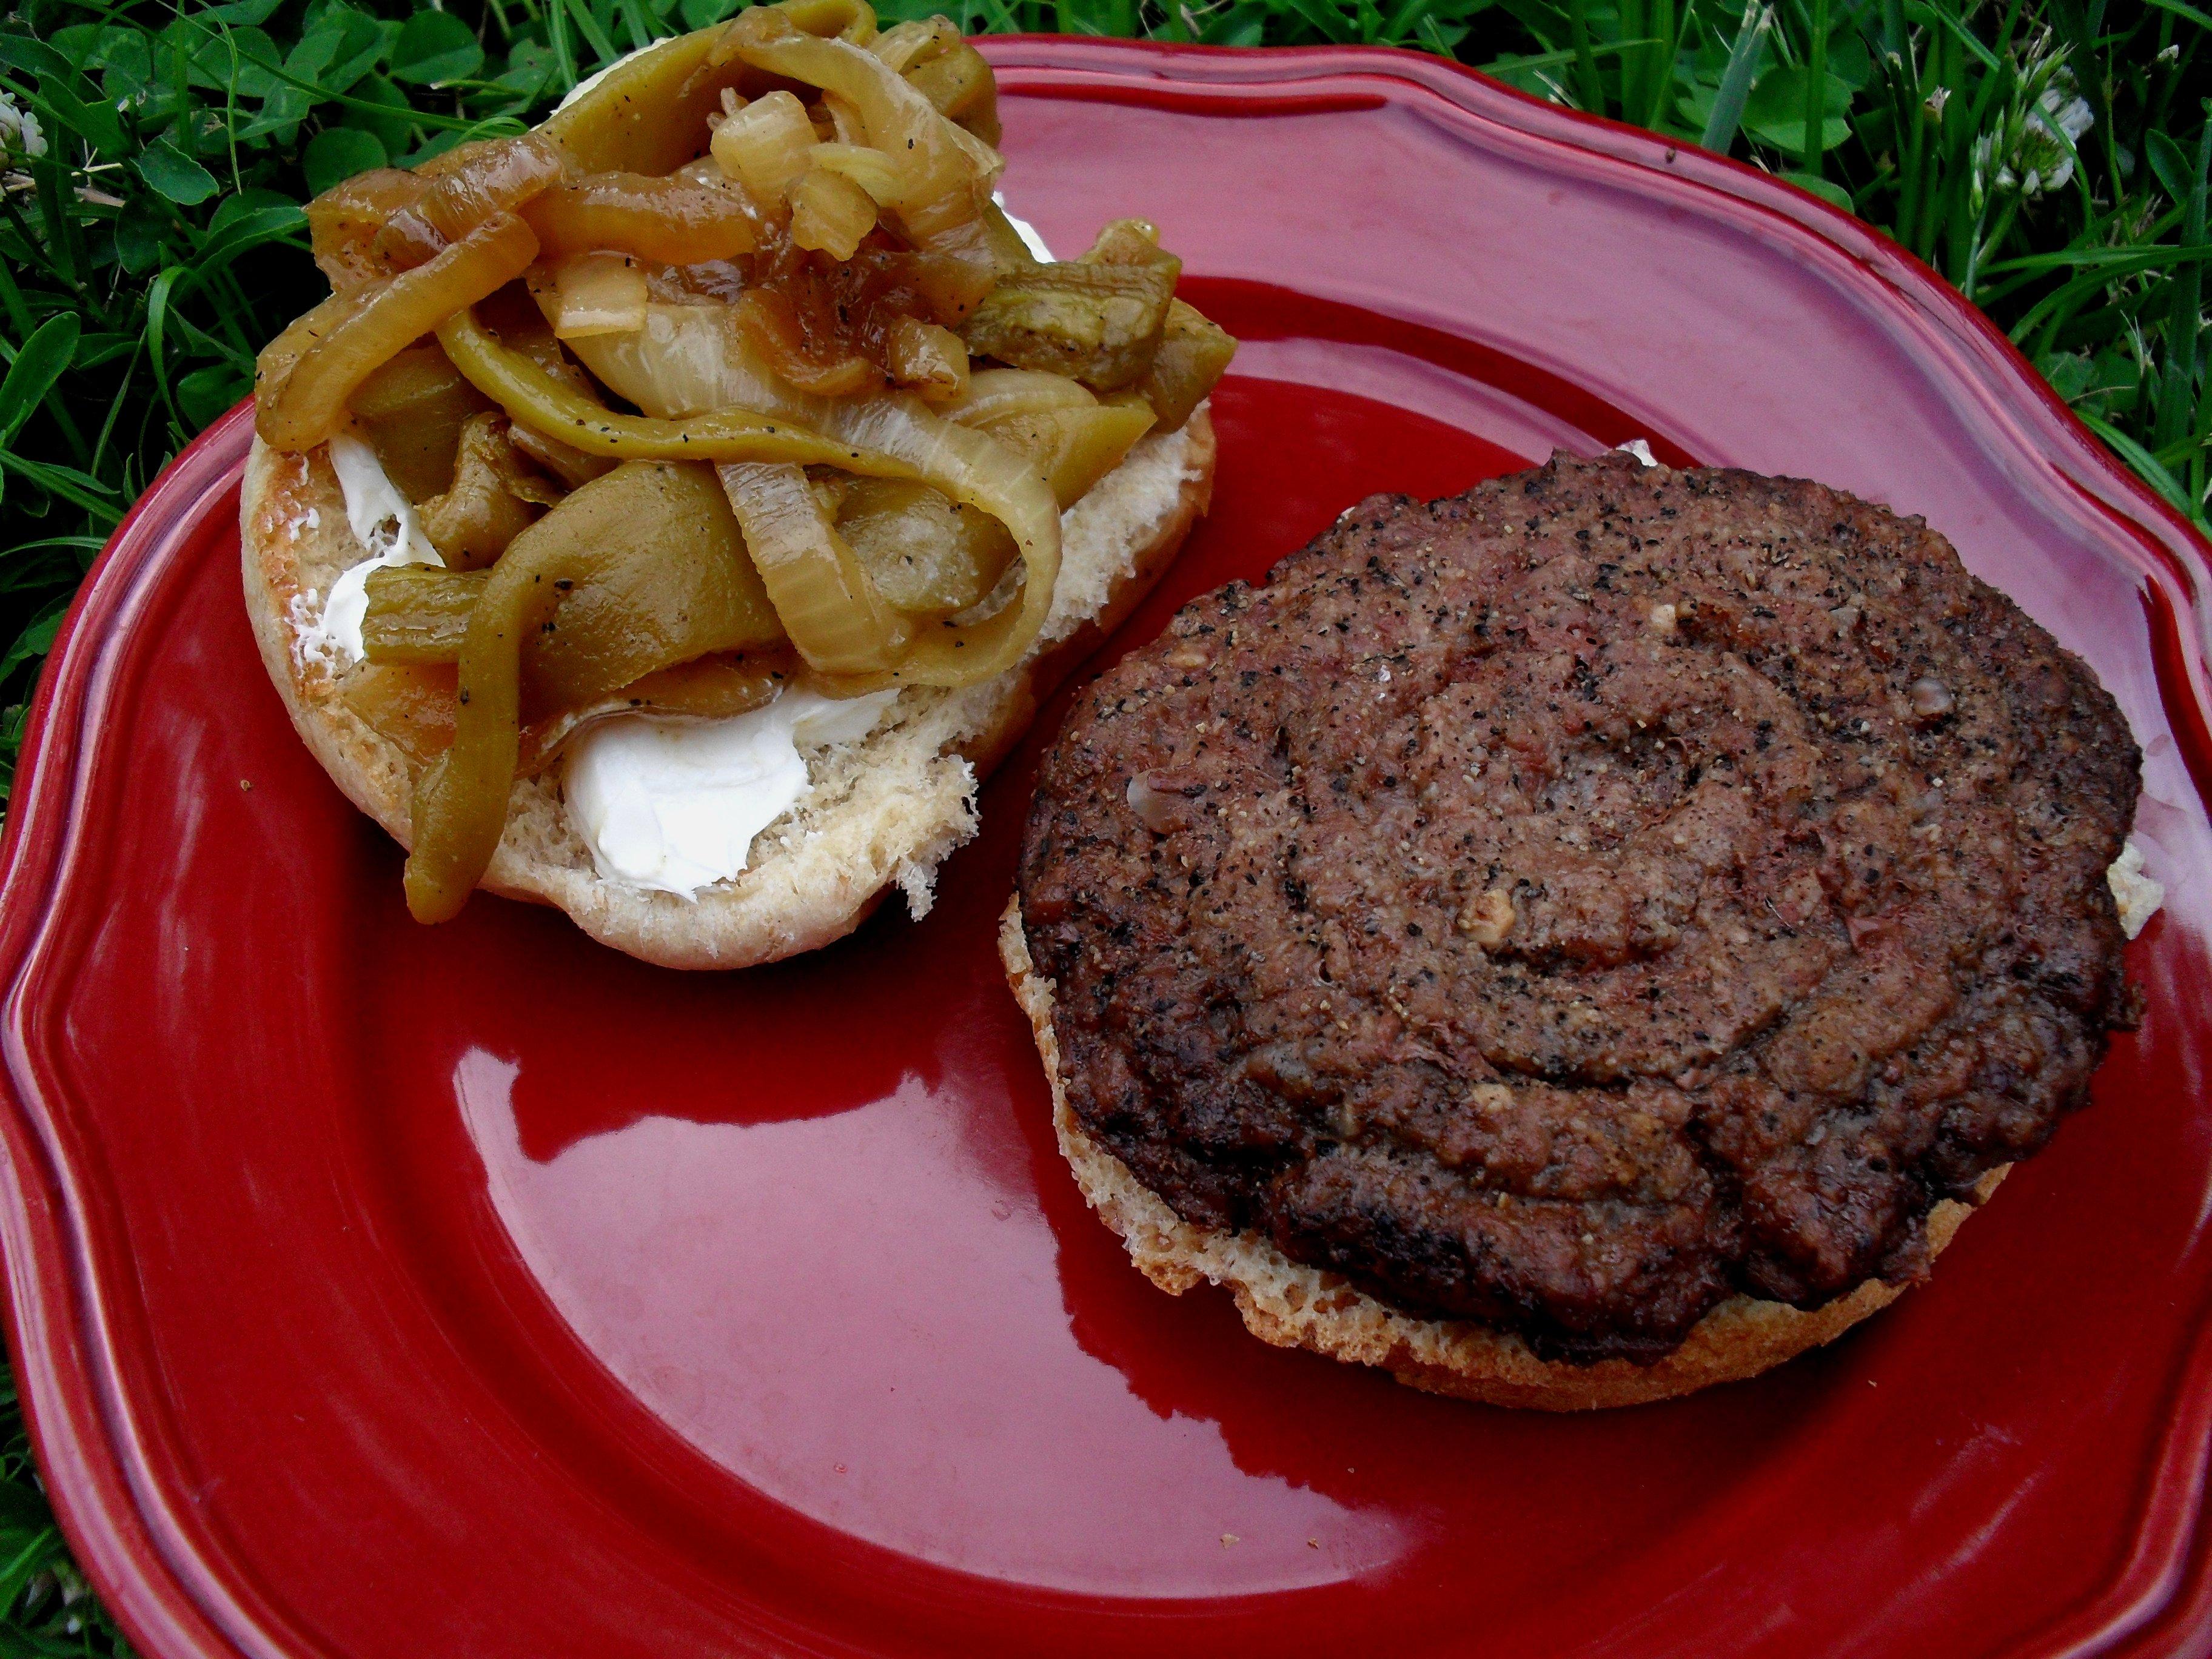 Green Chile Pepper And Cream Cheese Burgers Recipes — Dishmaps